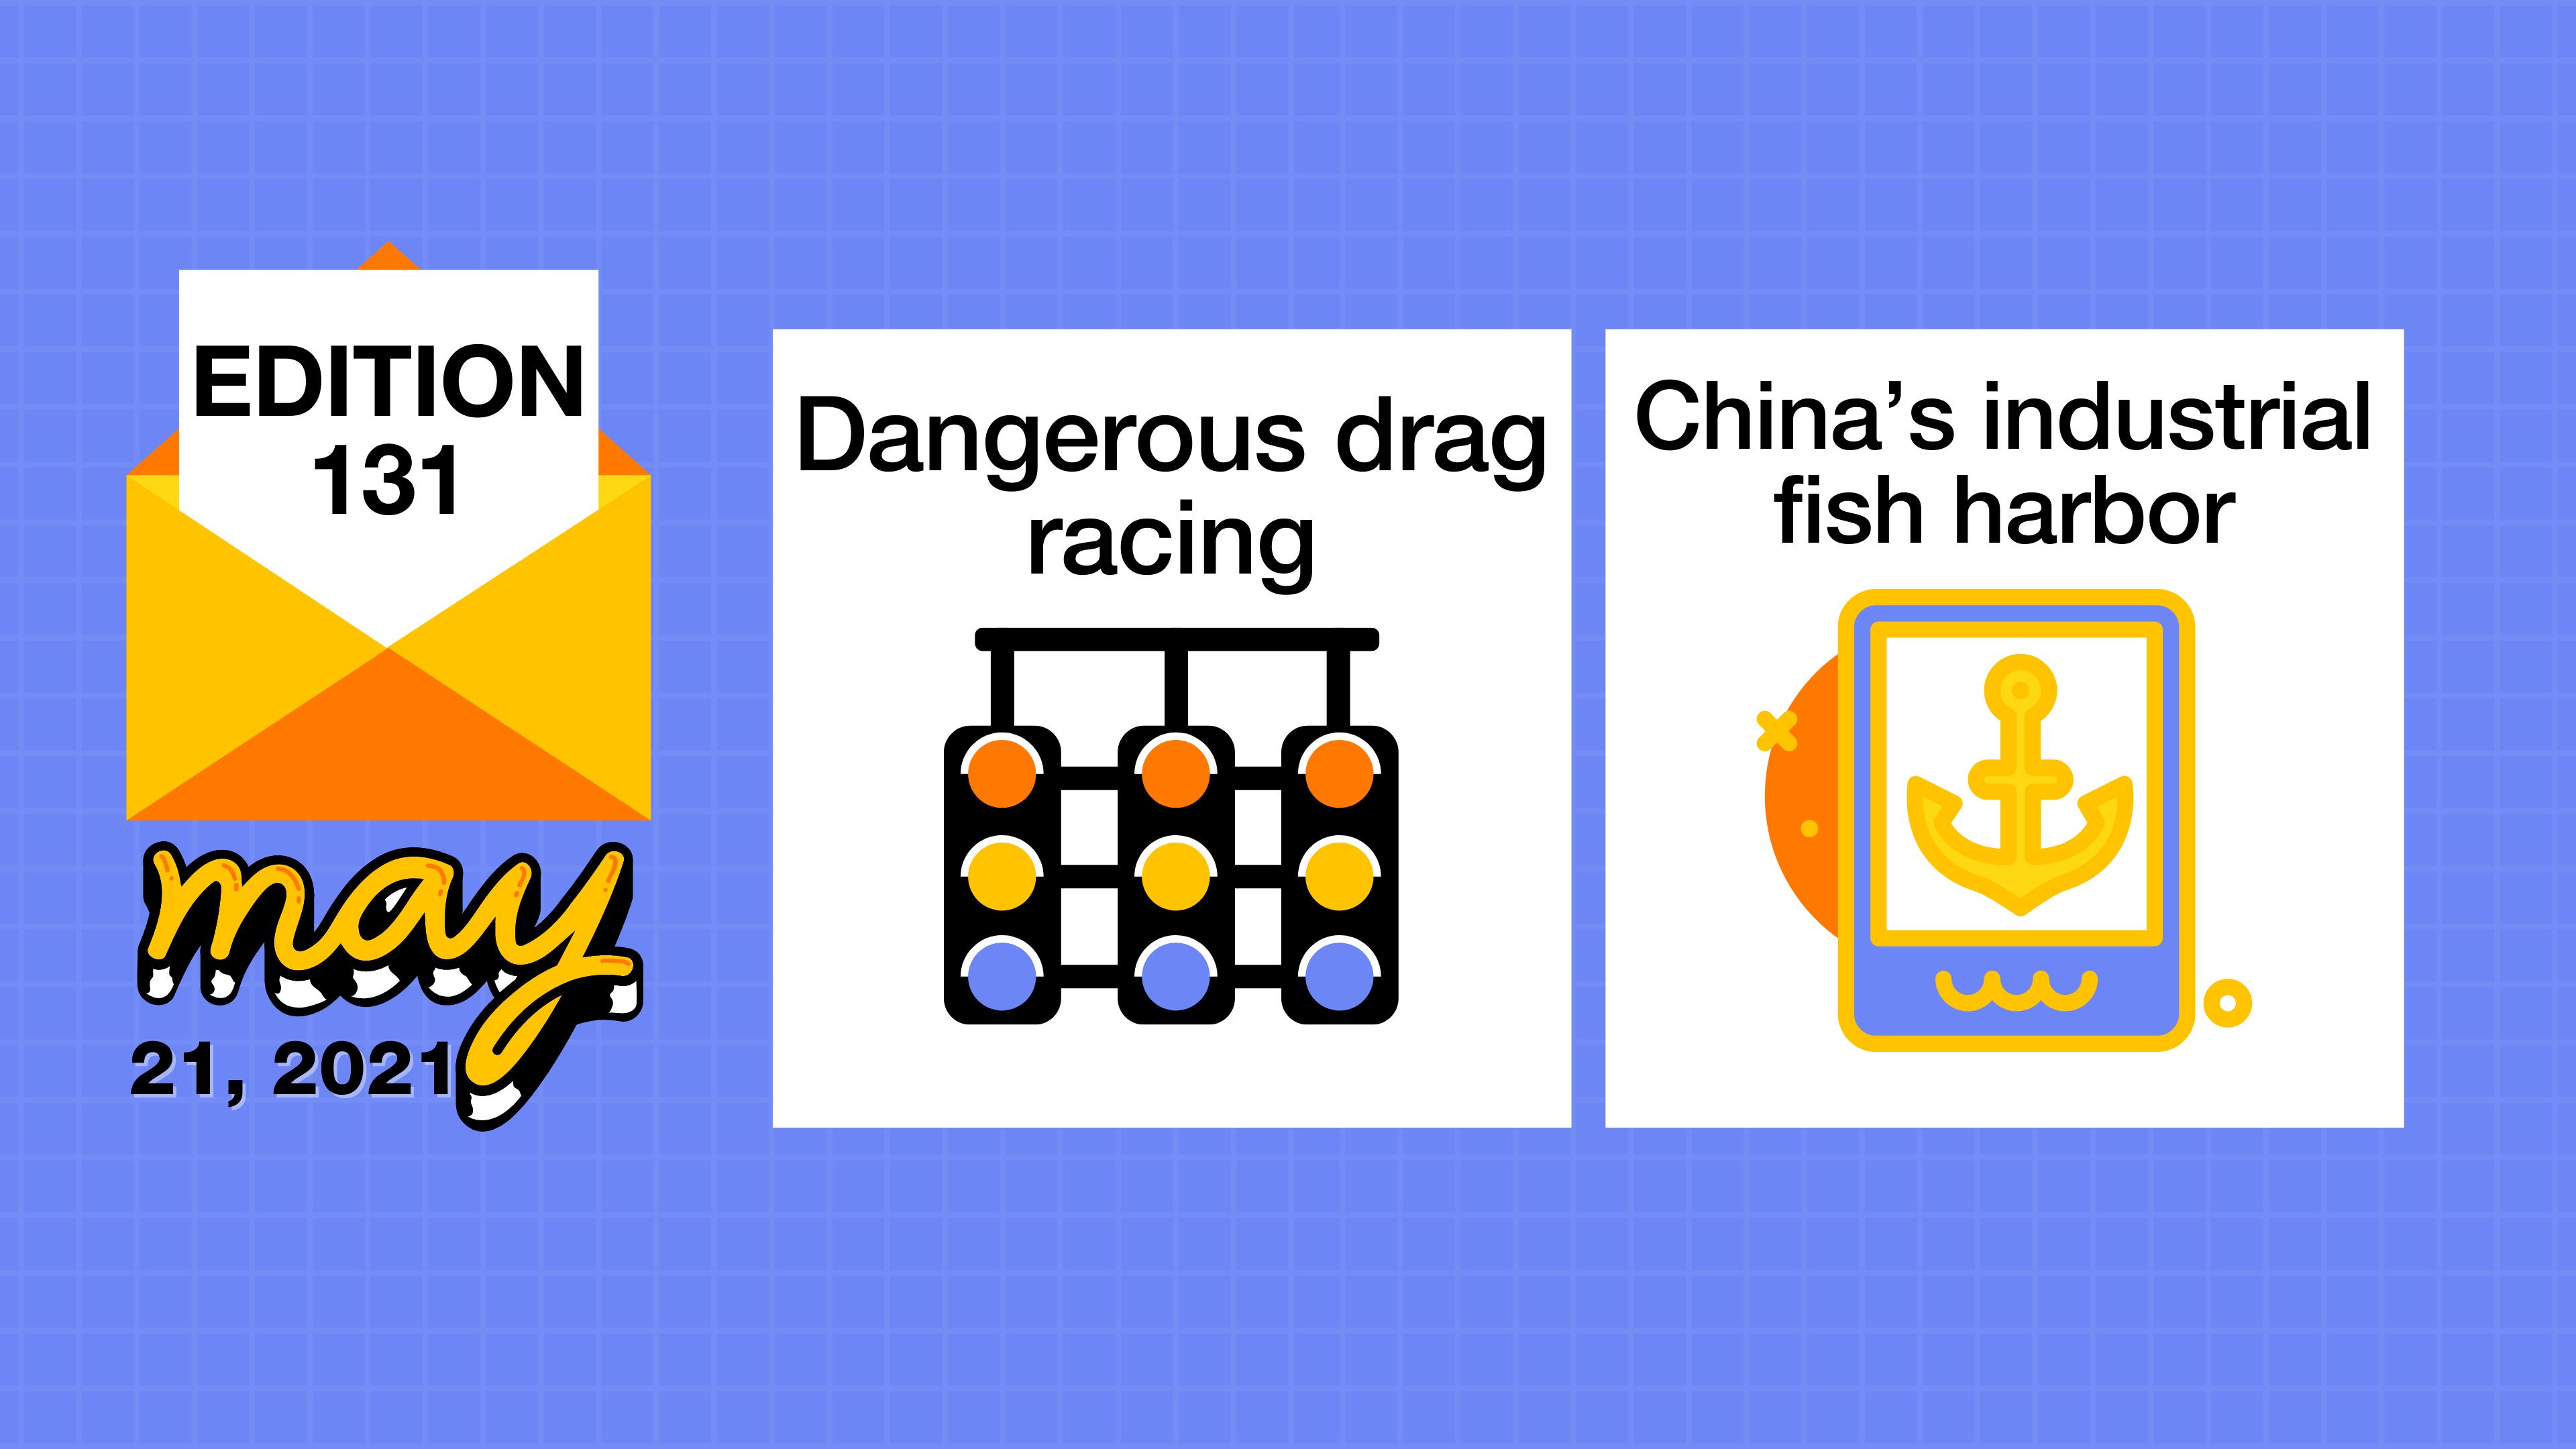 Dangerous drag racing and China's industrial fish harbor